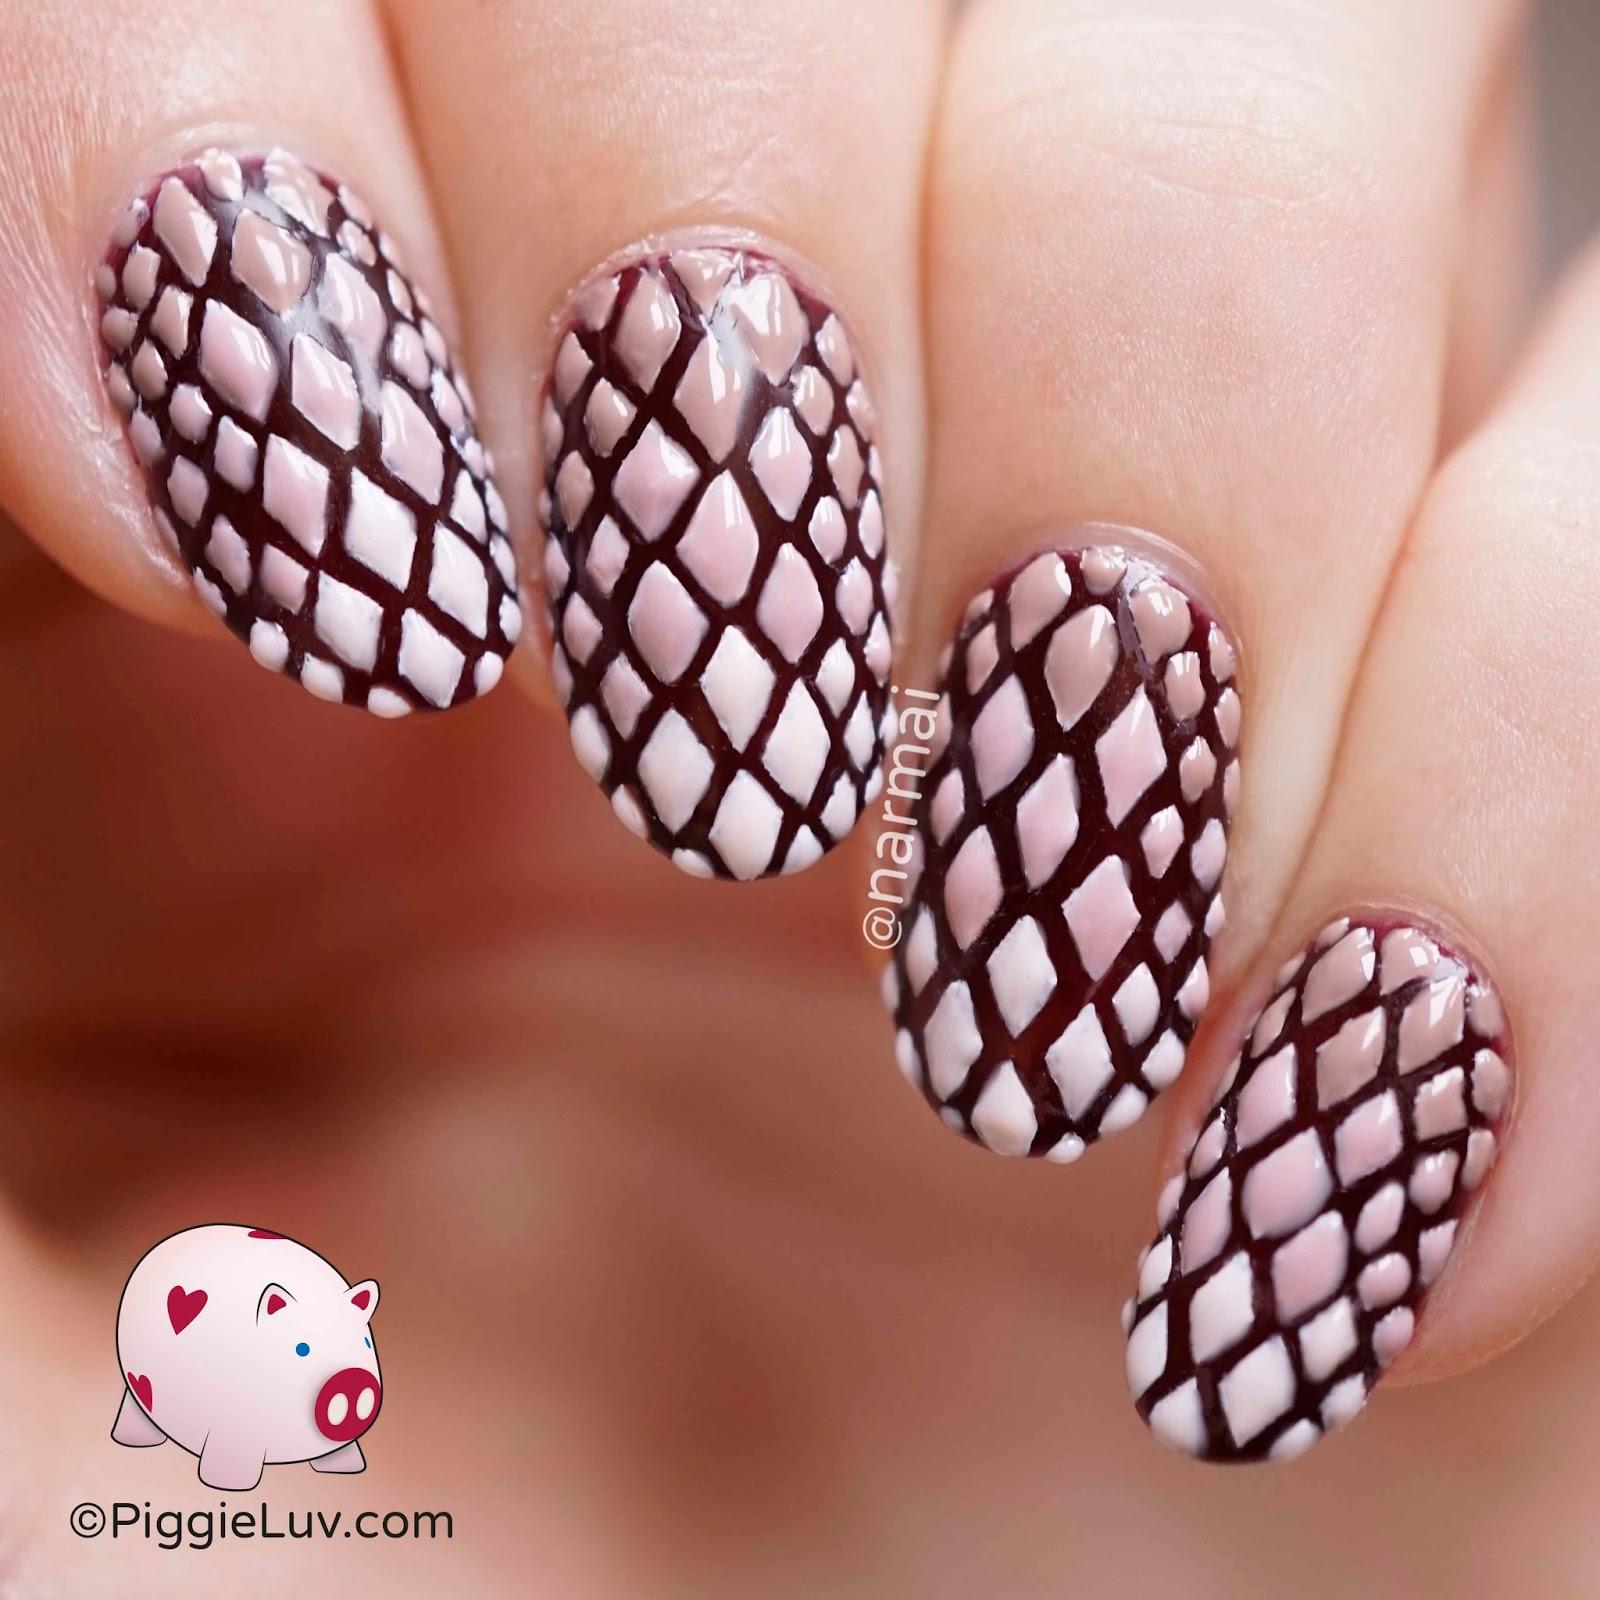 Piggieluv 3d Dragon Skin Nail Art